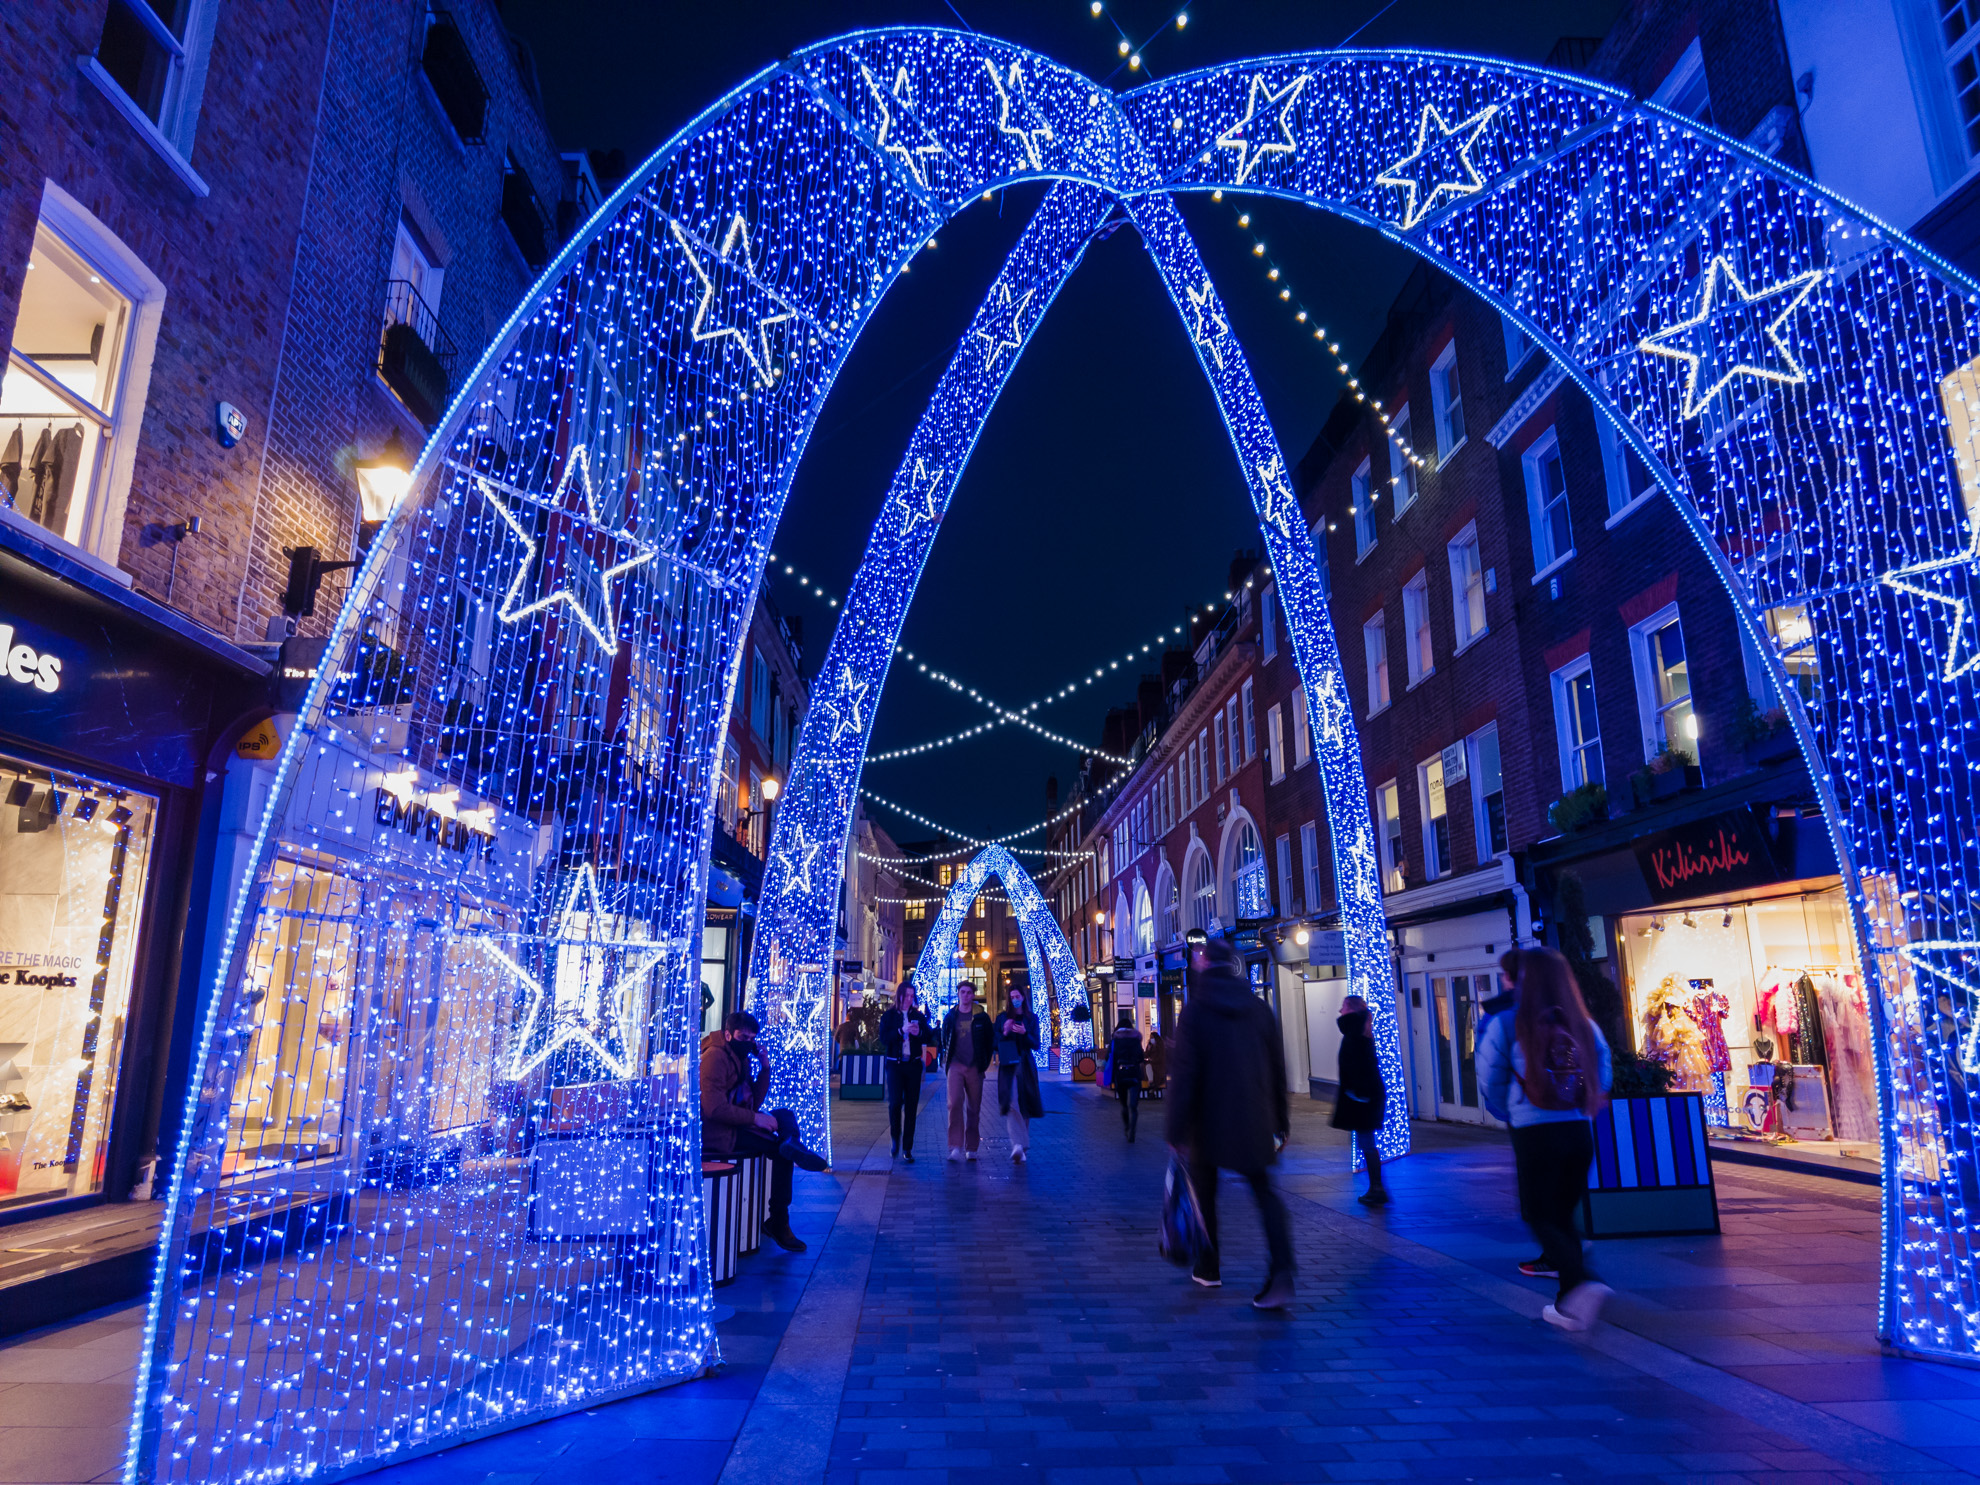 Molton Street, London